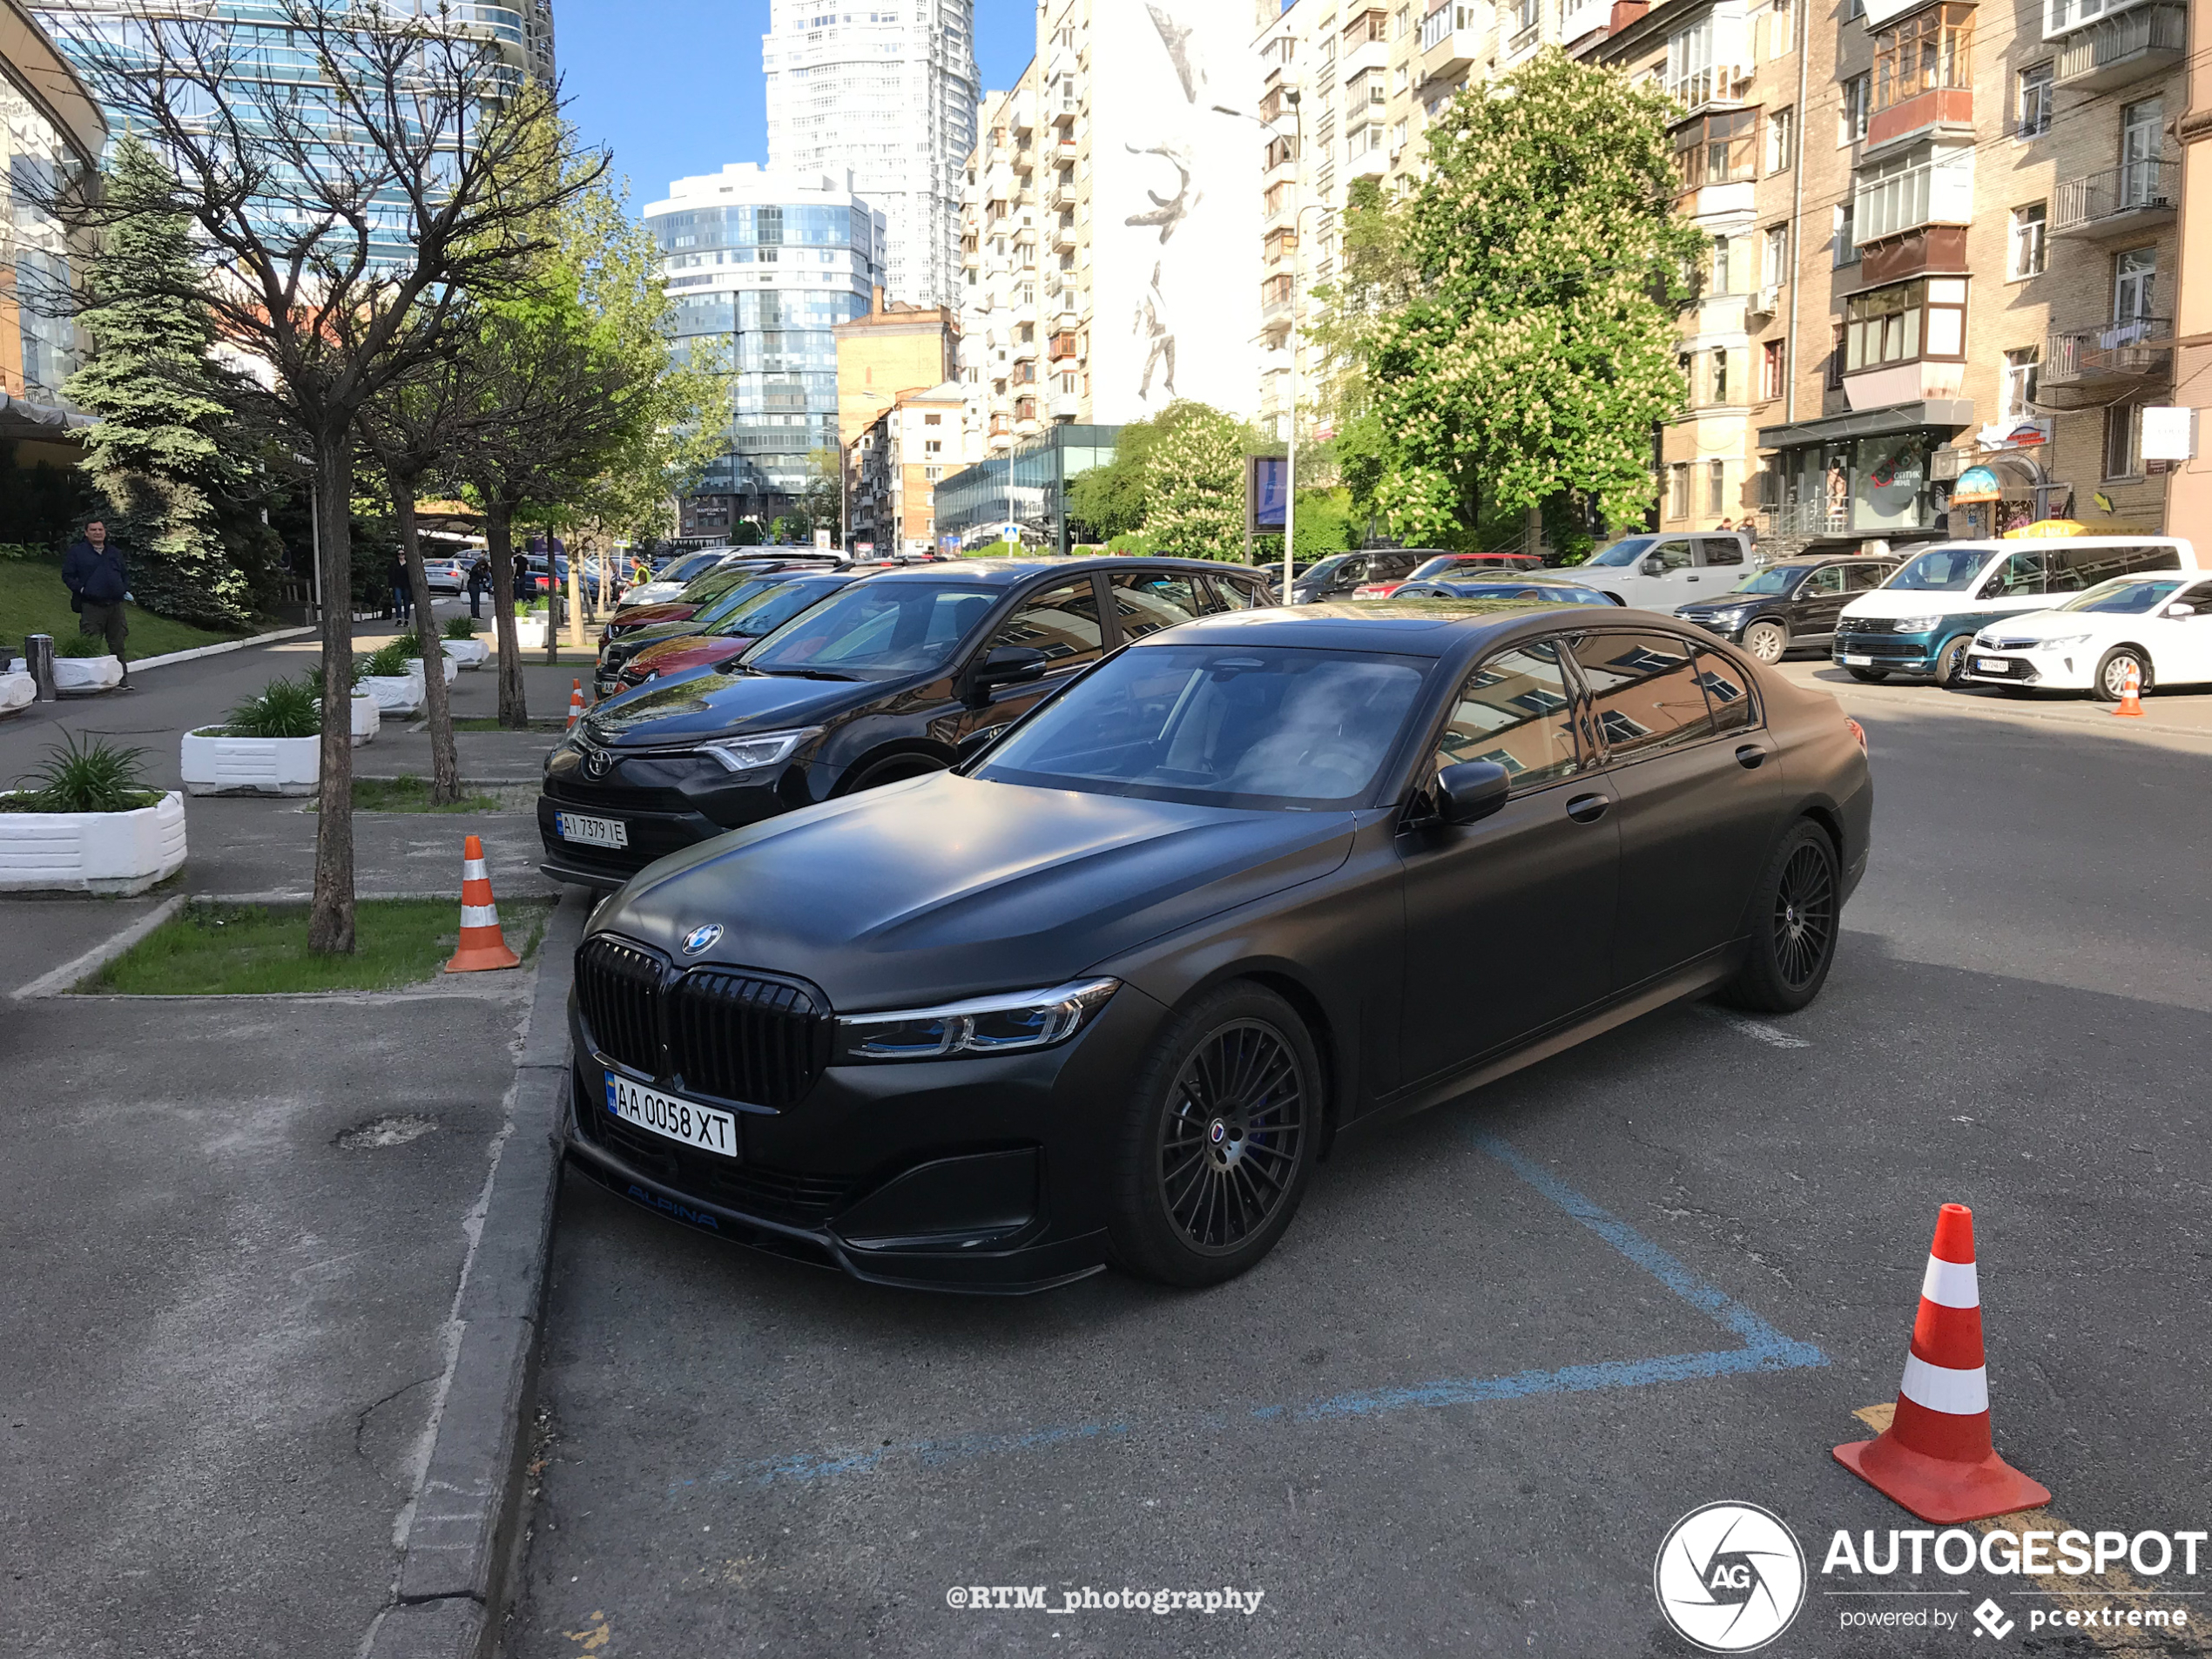 Alpina B7 Biturbo 2020